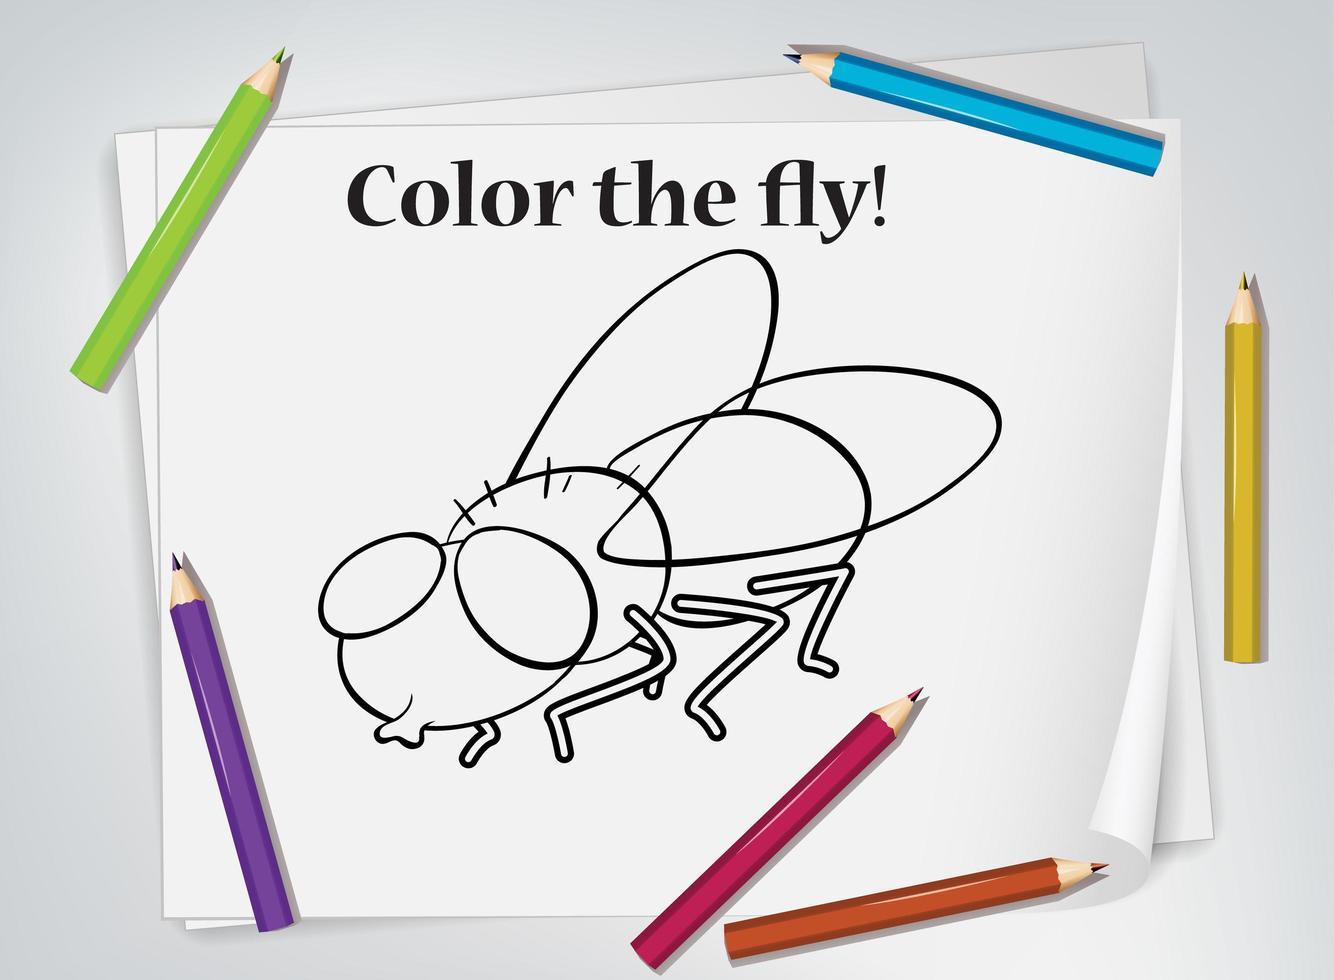 barn flyga målarbok vektor